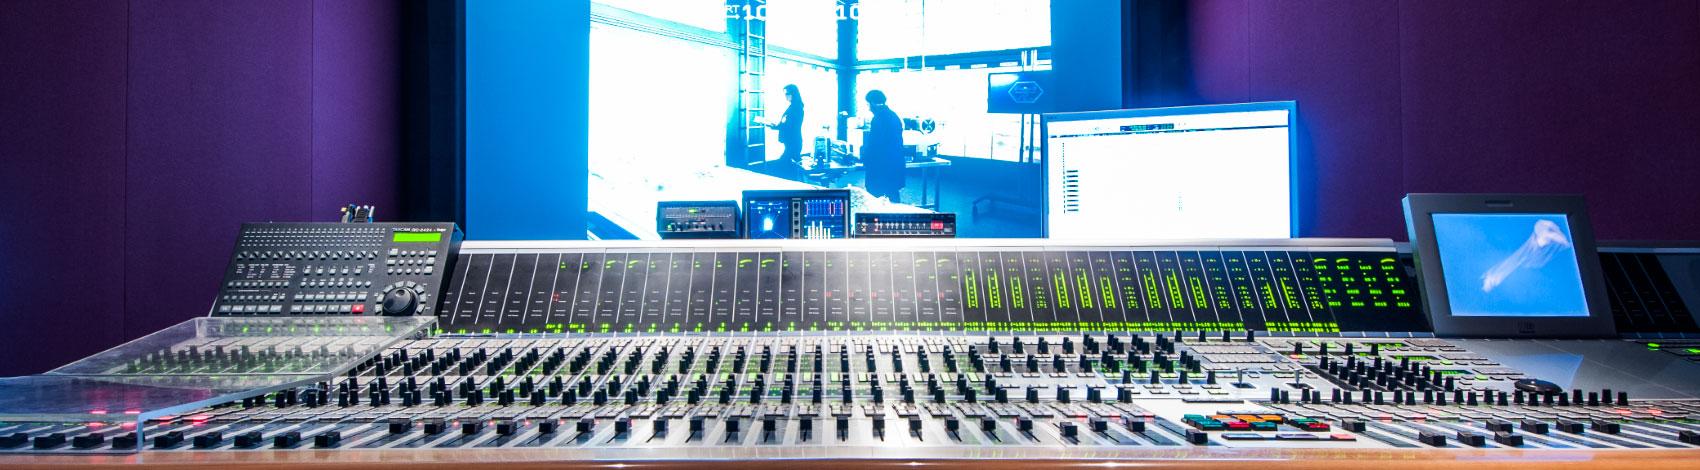 slider-studios-25